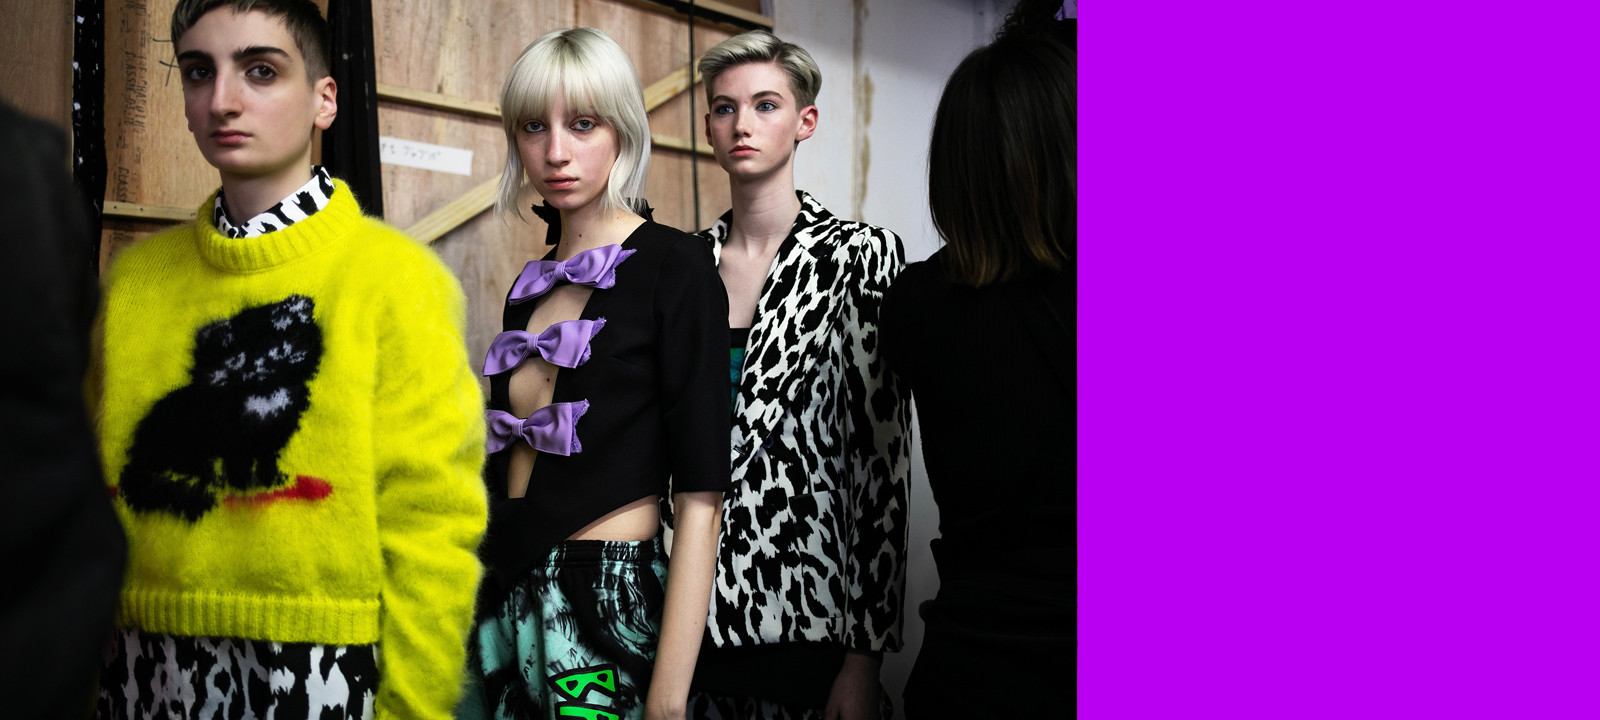 Ashley Williams London Fashion Week Backstage Fw19 Fall Winter 2019 Yellow Cat Sweater Purple Bows